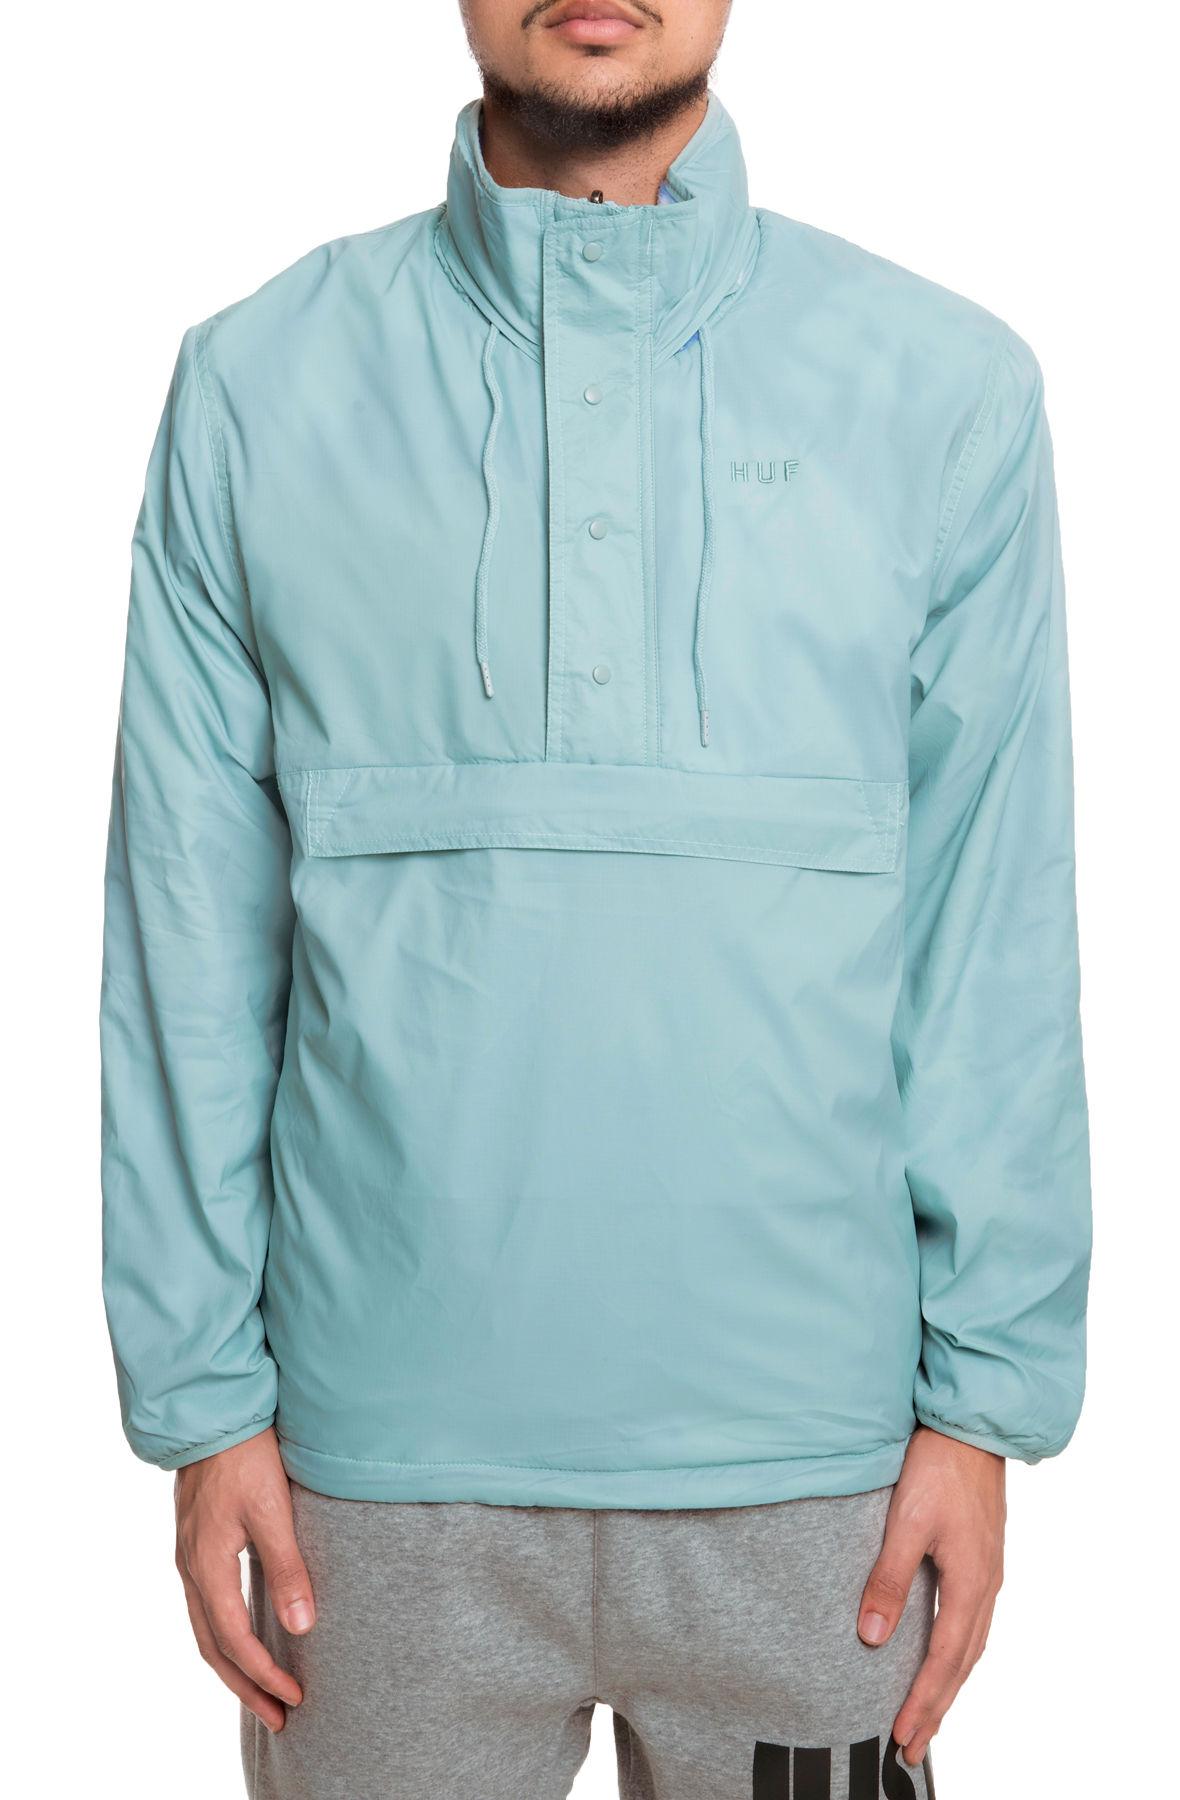 Image of The Kumo Reversible Quarter Zip Jacket in Cloud Dye Blue